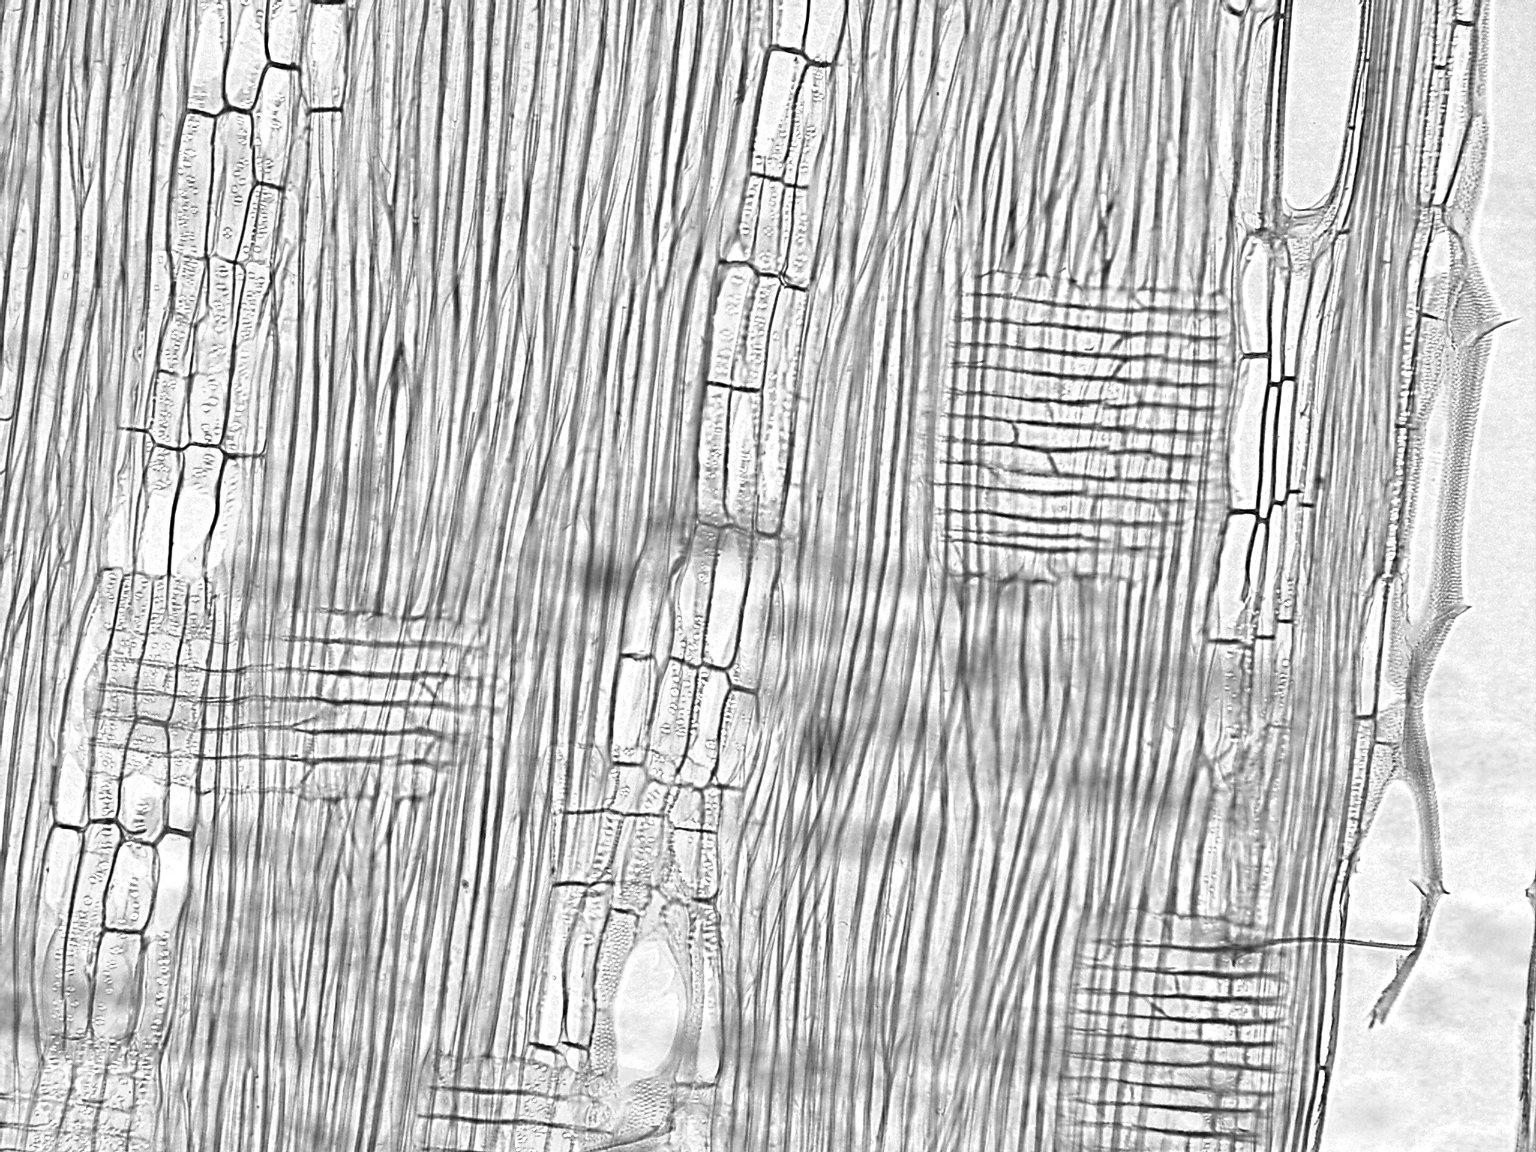 BIGNONIACEAE Tabebuia obtusifolia